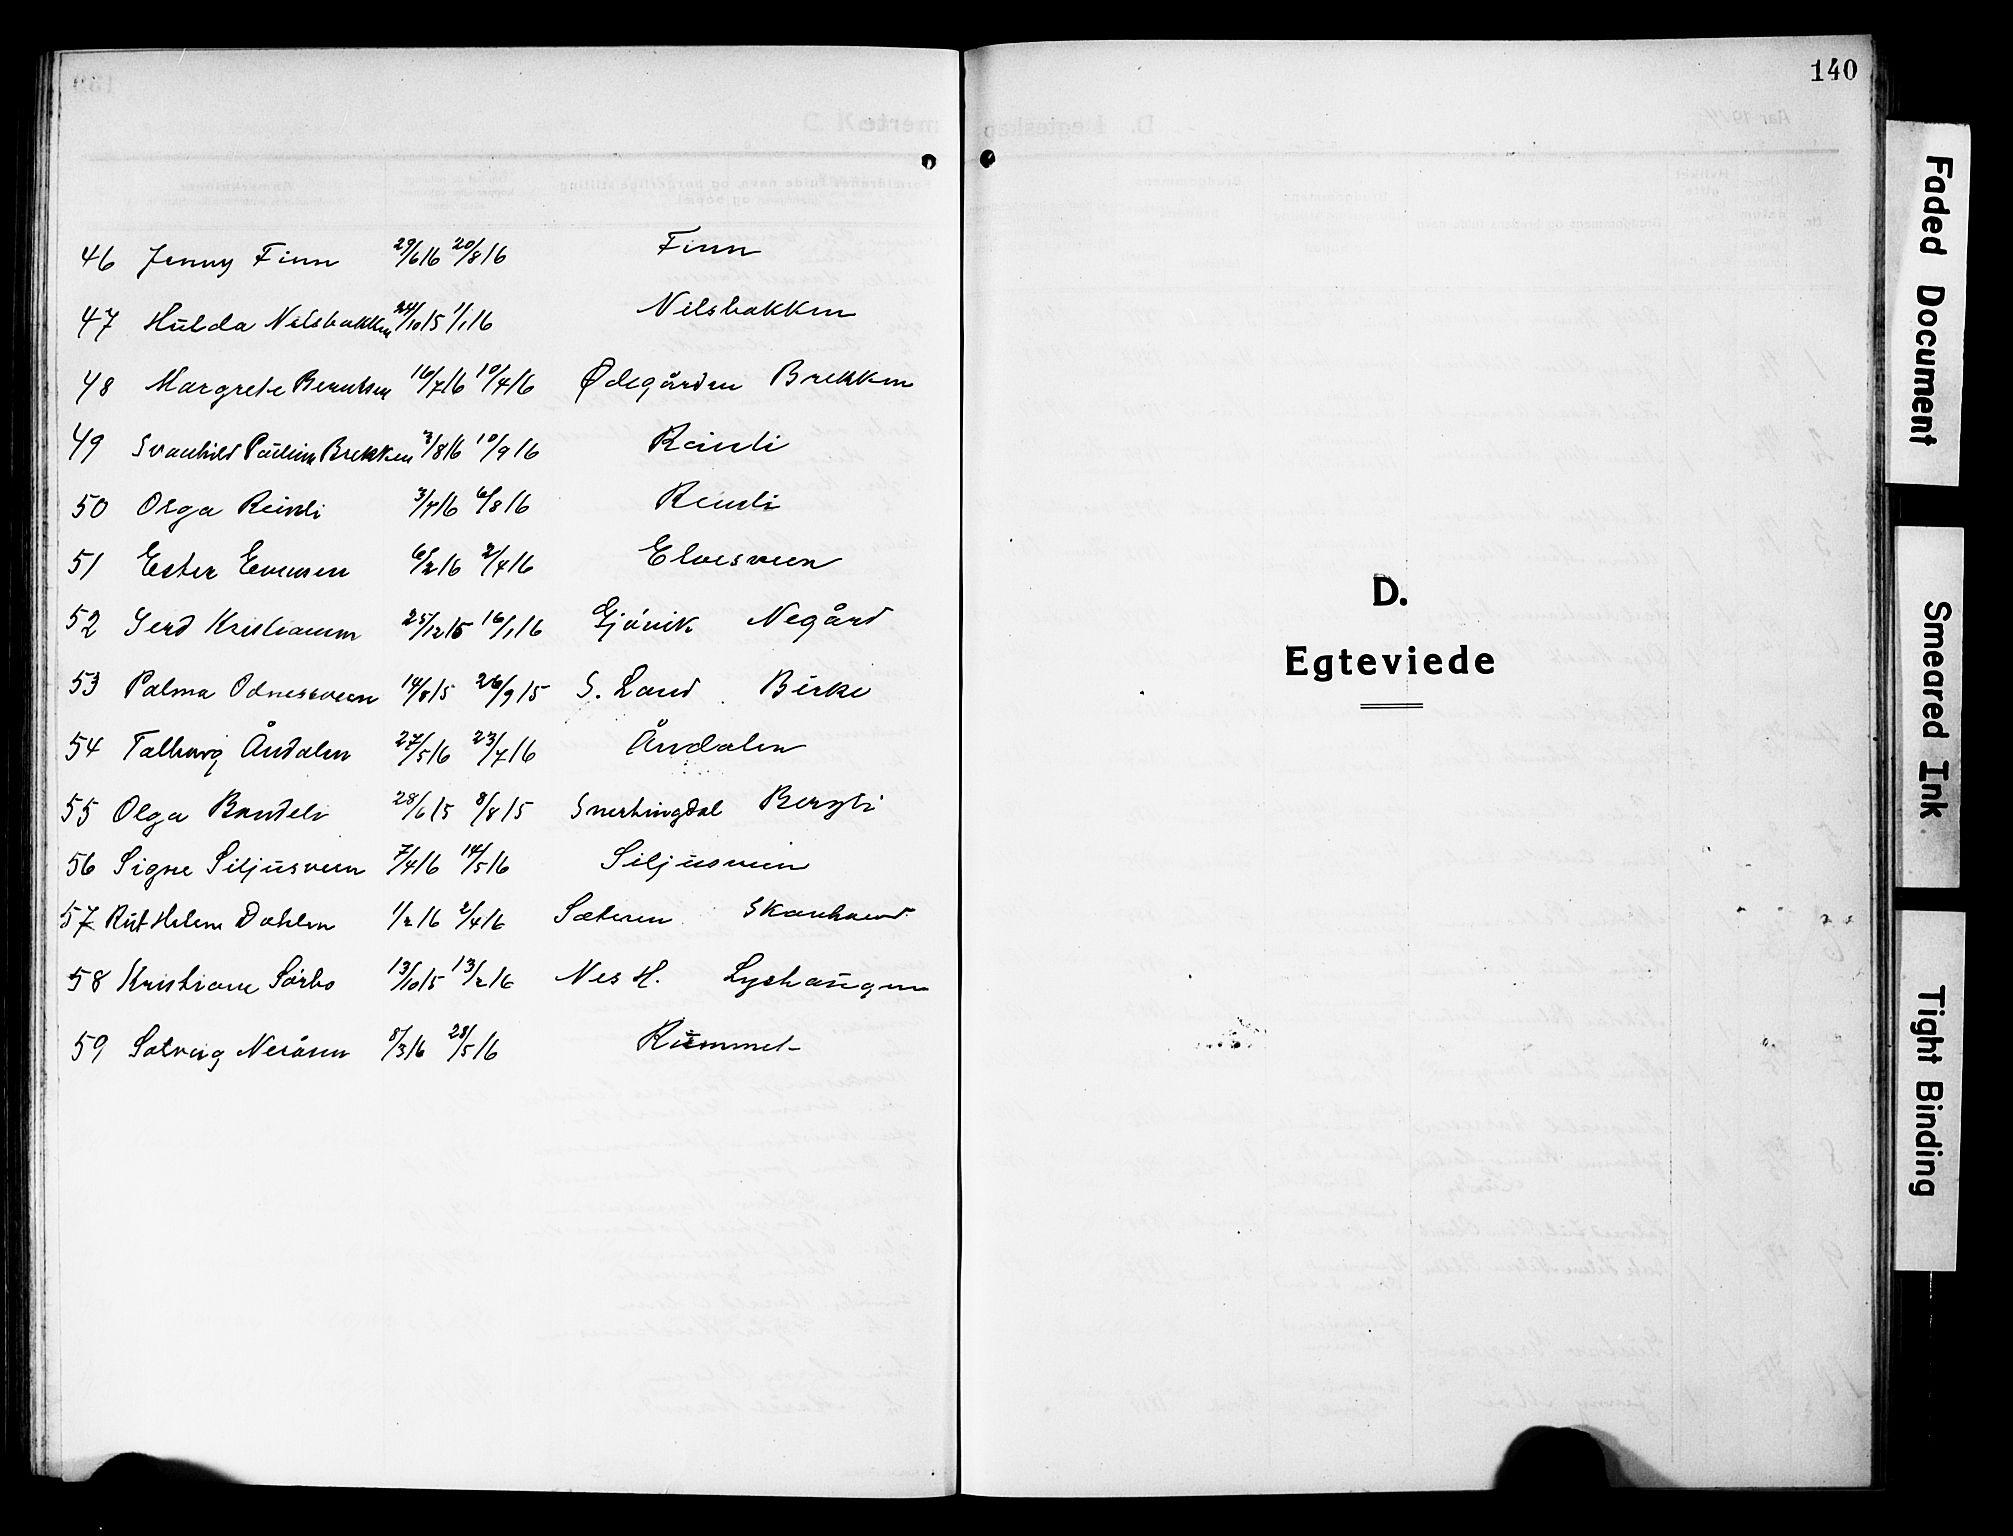 SAH, Vardal prestekontor, H/Ha/Hab/L0015: Klokkerbok nr. 15, 1914-1931, s. 140